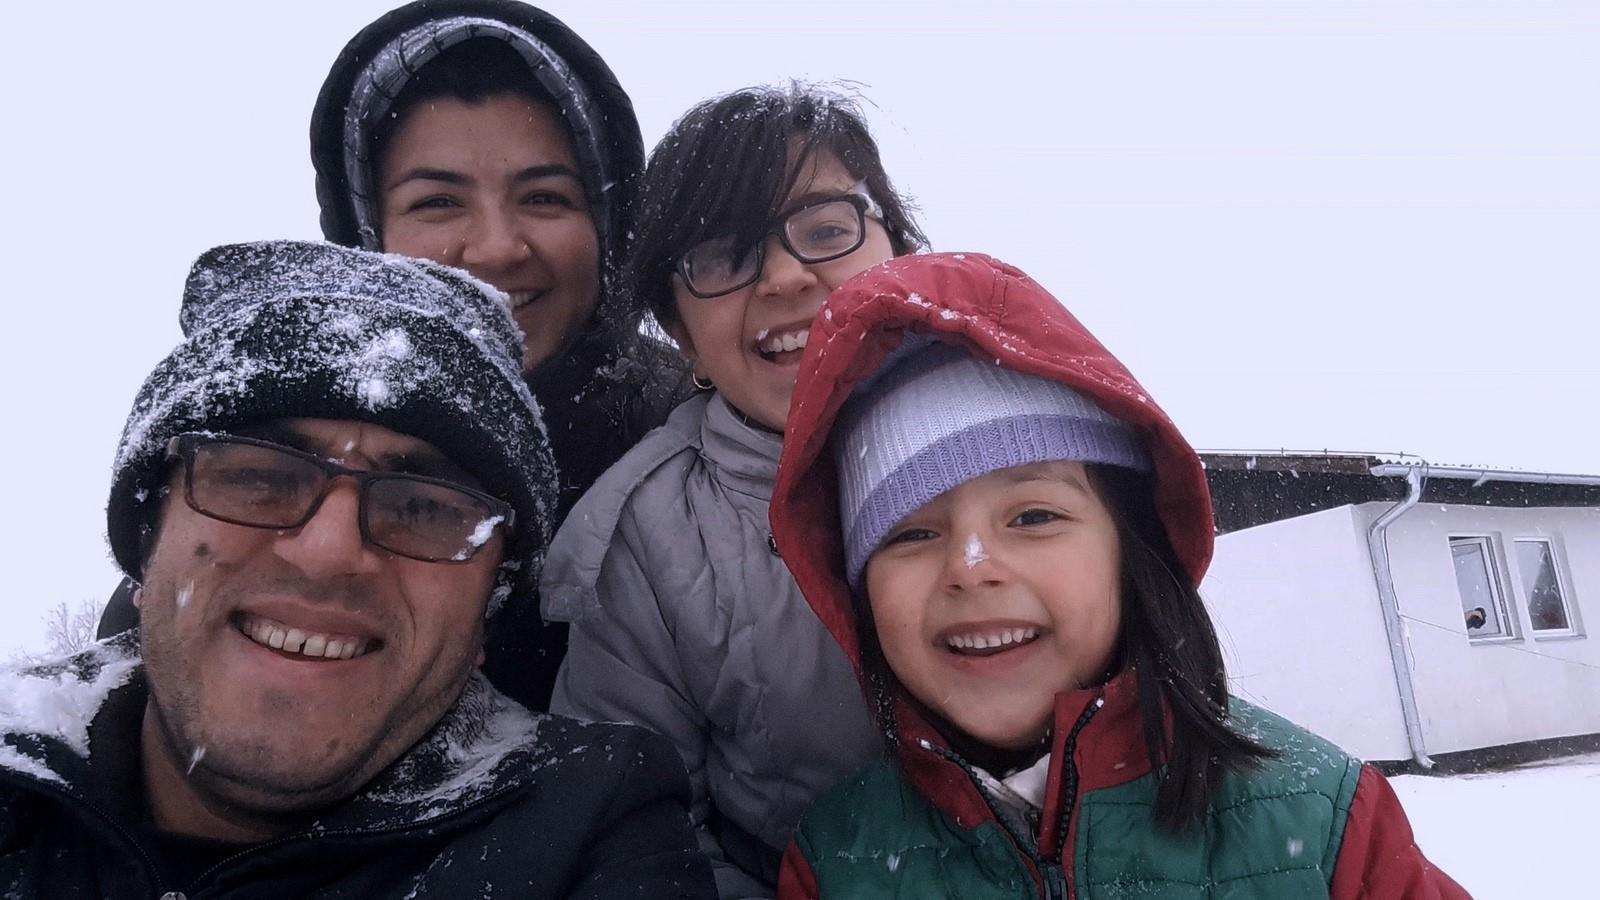 Hassan Fazili (front L), Zahra Fazili (front R), Fatima Hussaini (back L) and Nargis Fazili (back R) pose together.